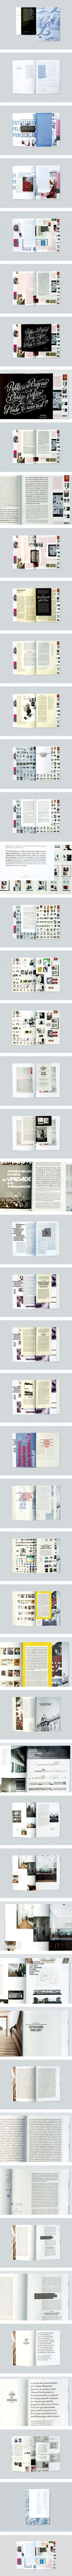 Pli * Arte e Design: Issue 2-3 / 2012 Enthusiasm by Atelier Martino